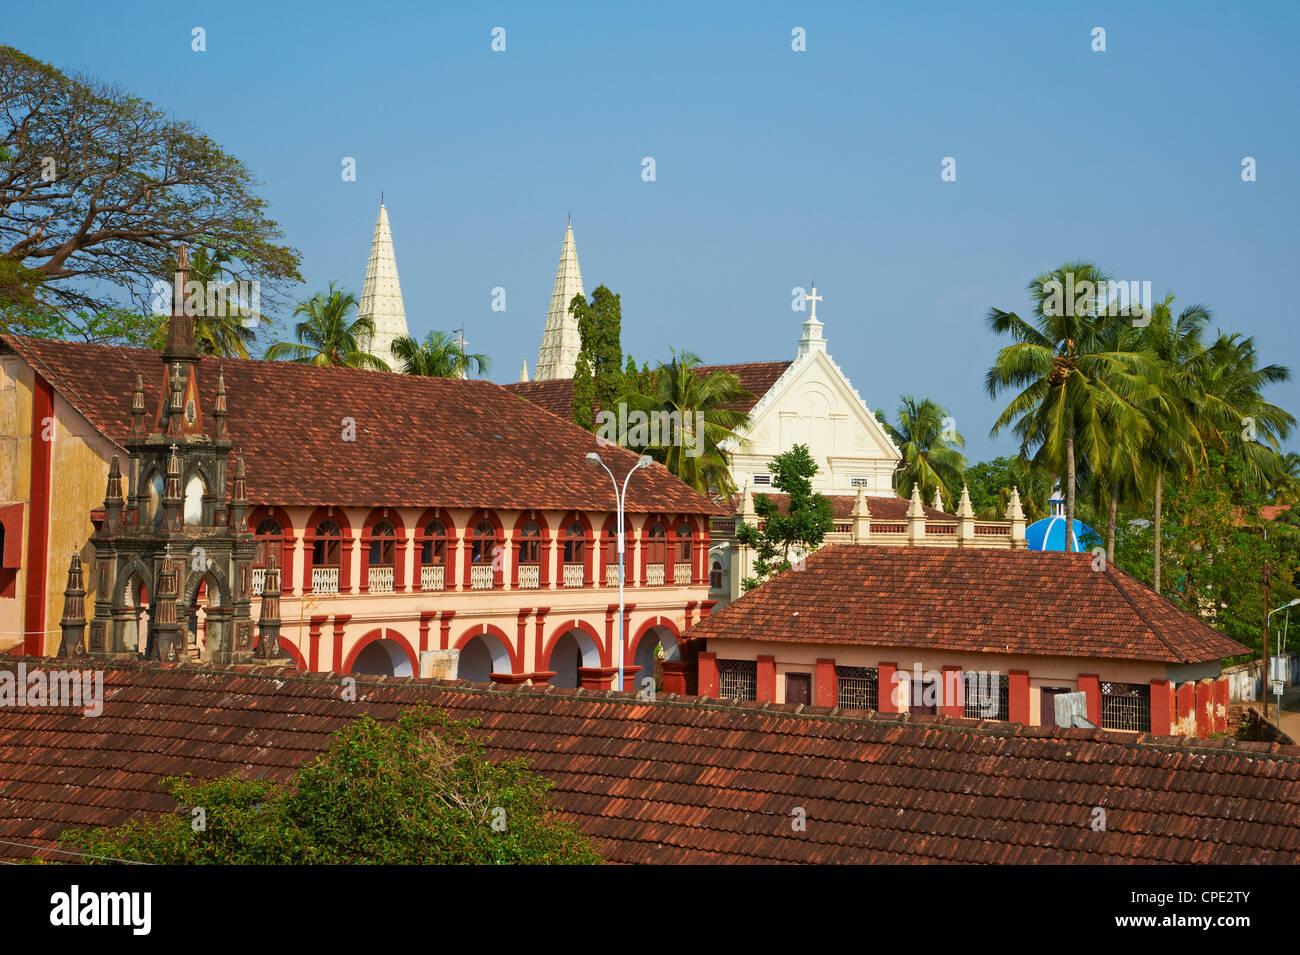 Santa Cruz Basilika und kolonialen Stil College in Fort Cochin, Kerala, Indien, Asien Stockbild